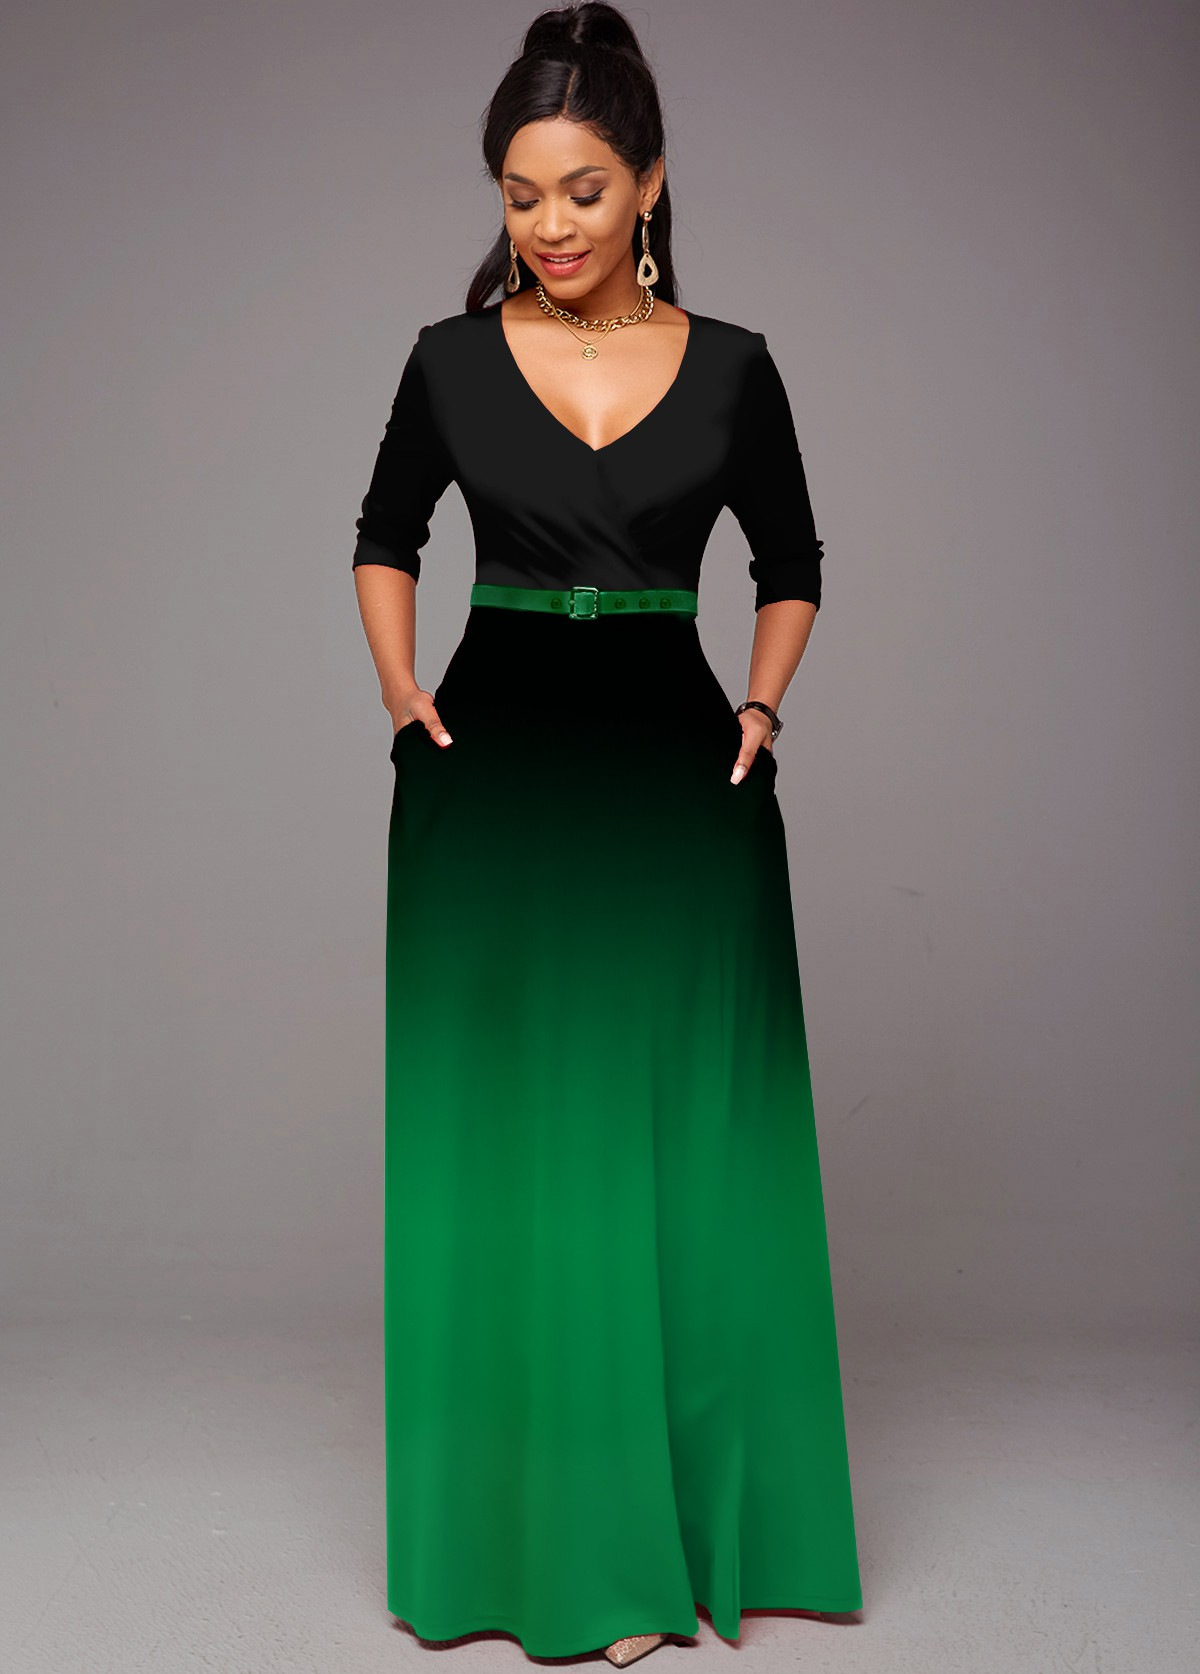 ROTITA 3/4 Sleeve Ombre V Neck Pocket Dress